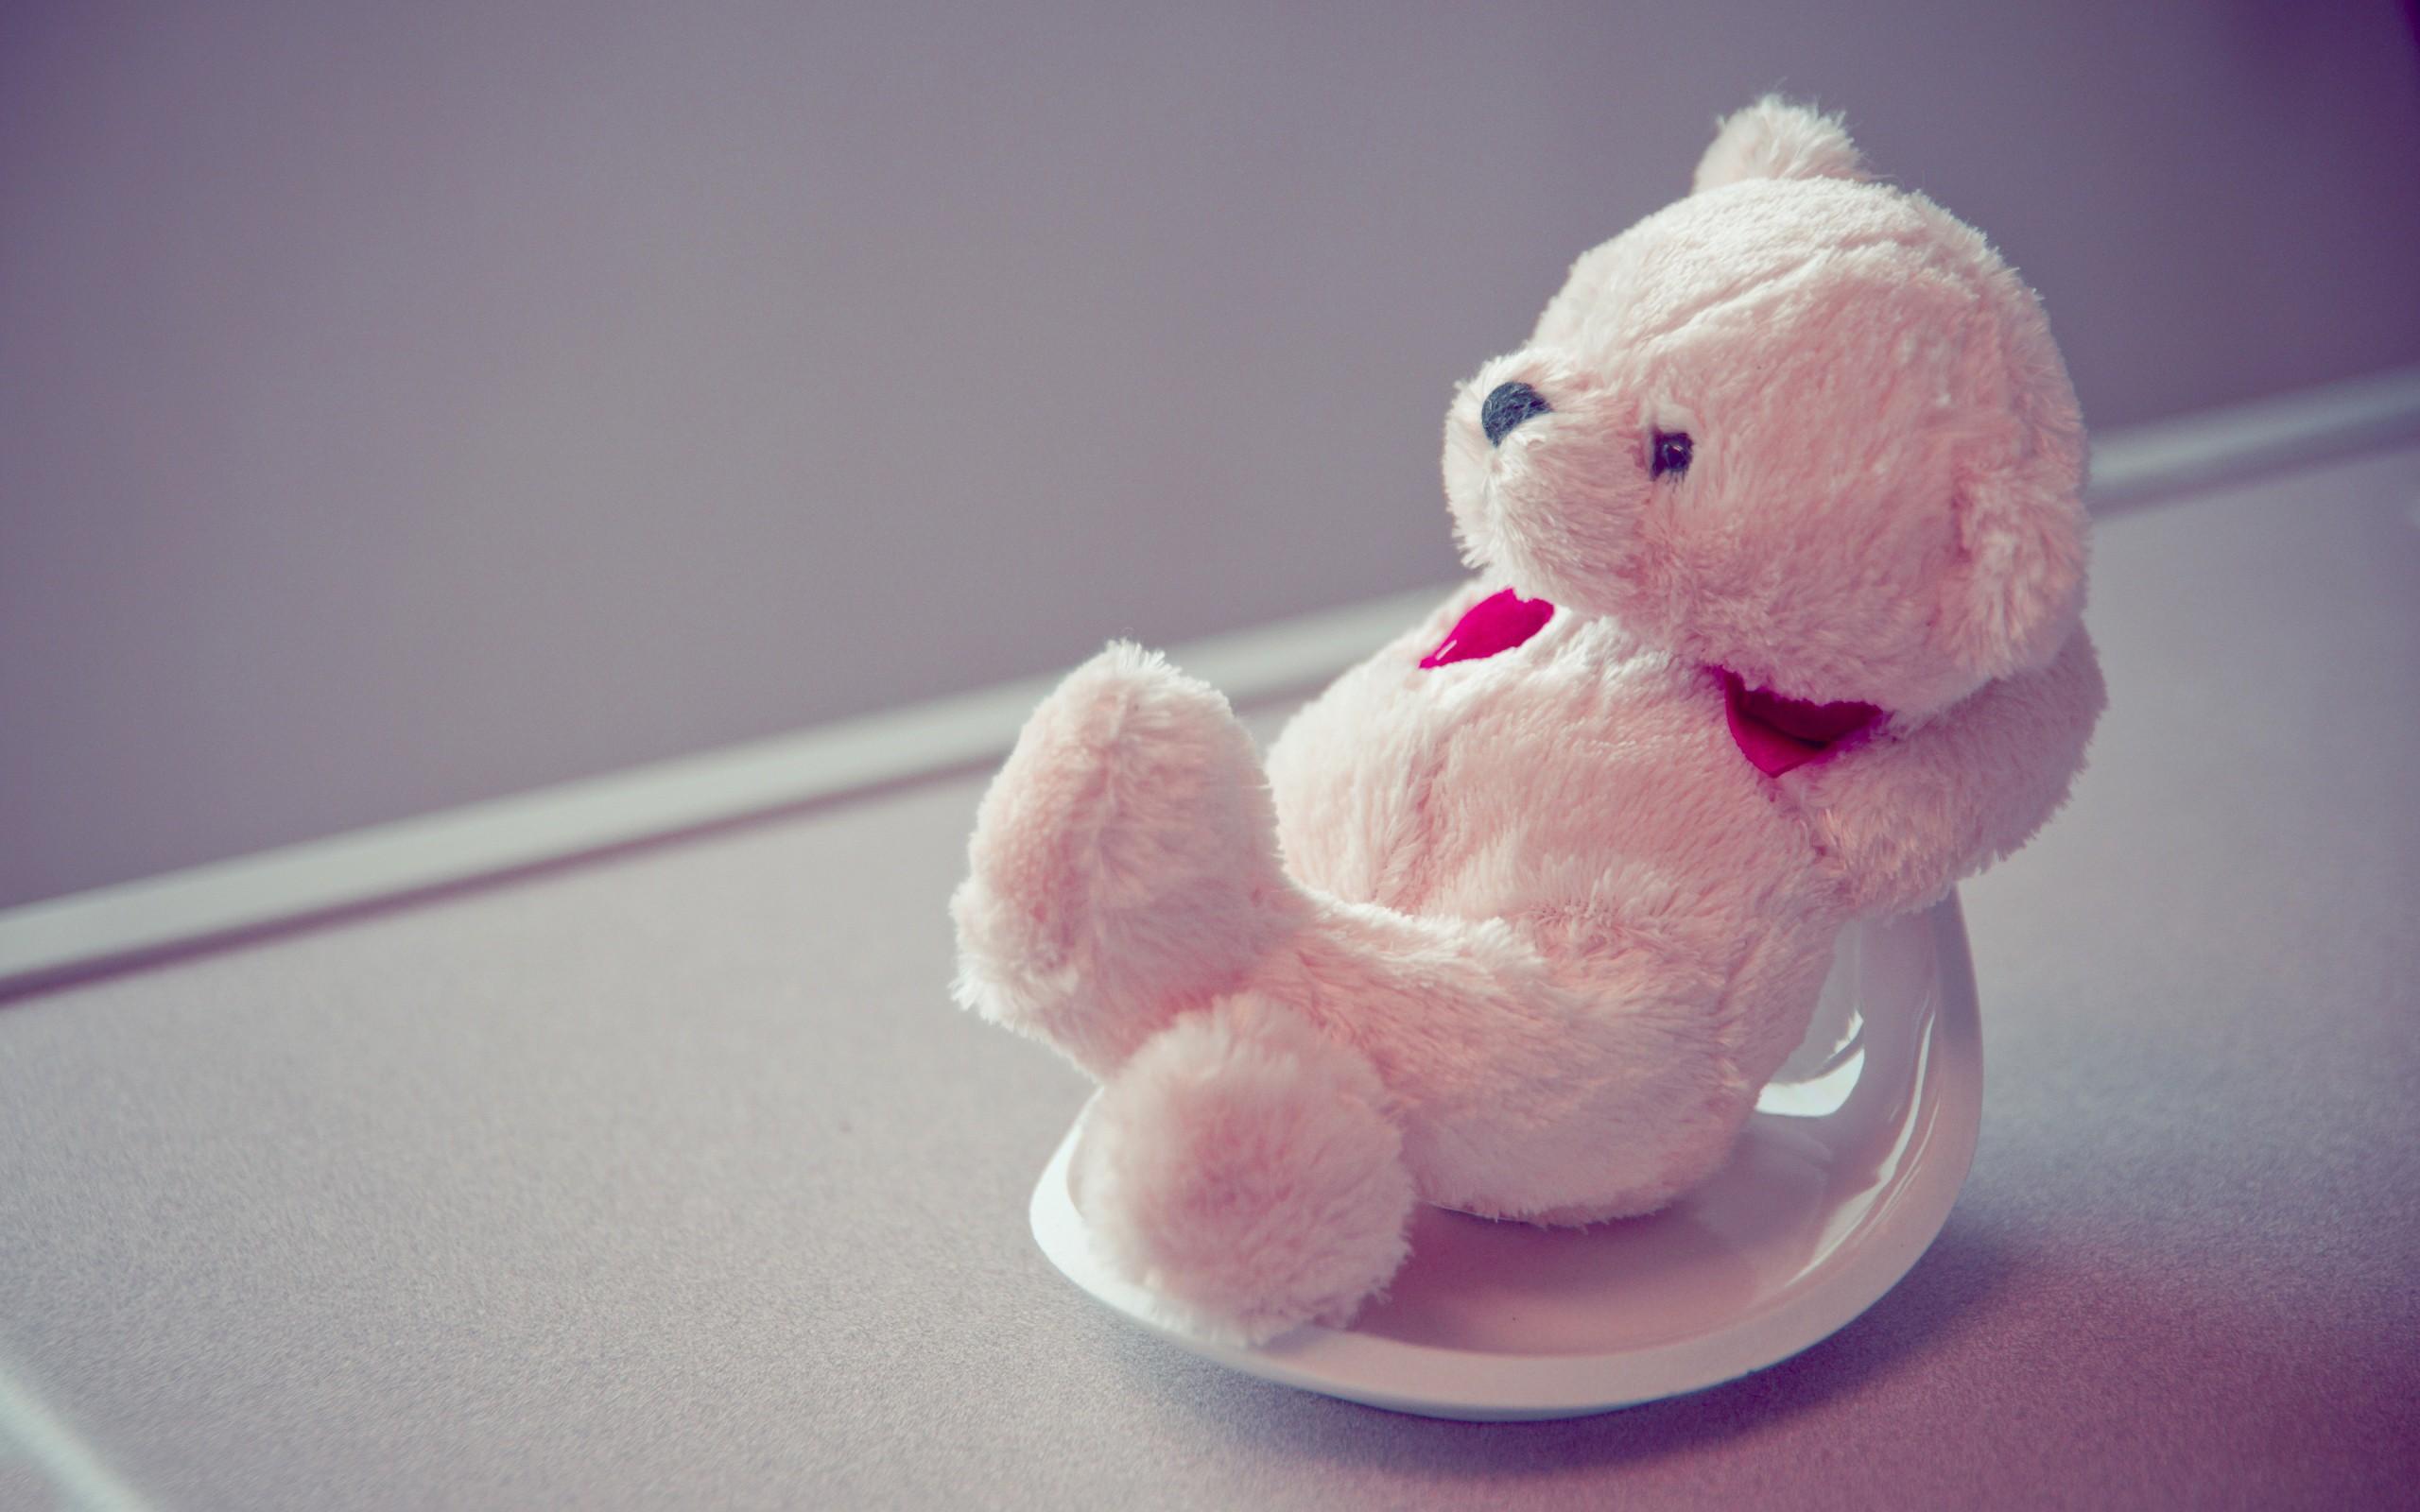 Teddy Bear Cute Wallpaper 11087 Wallpaper Cool Walldiskpapercom 2560x1600